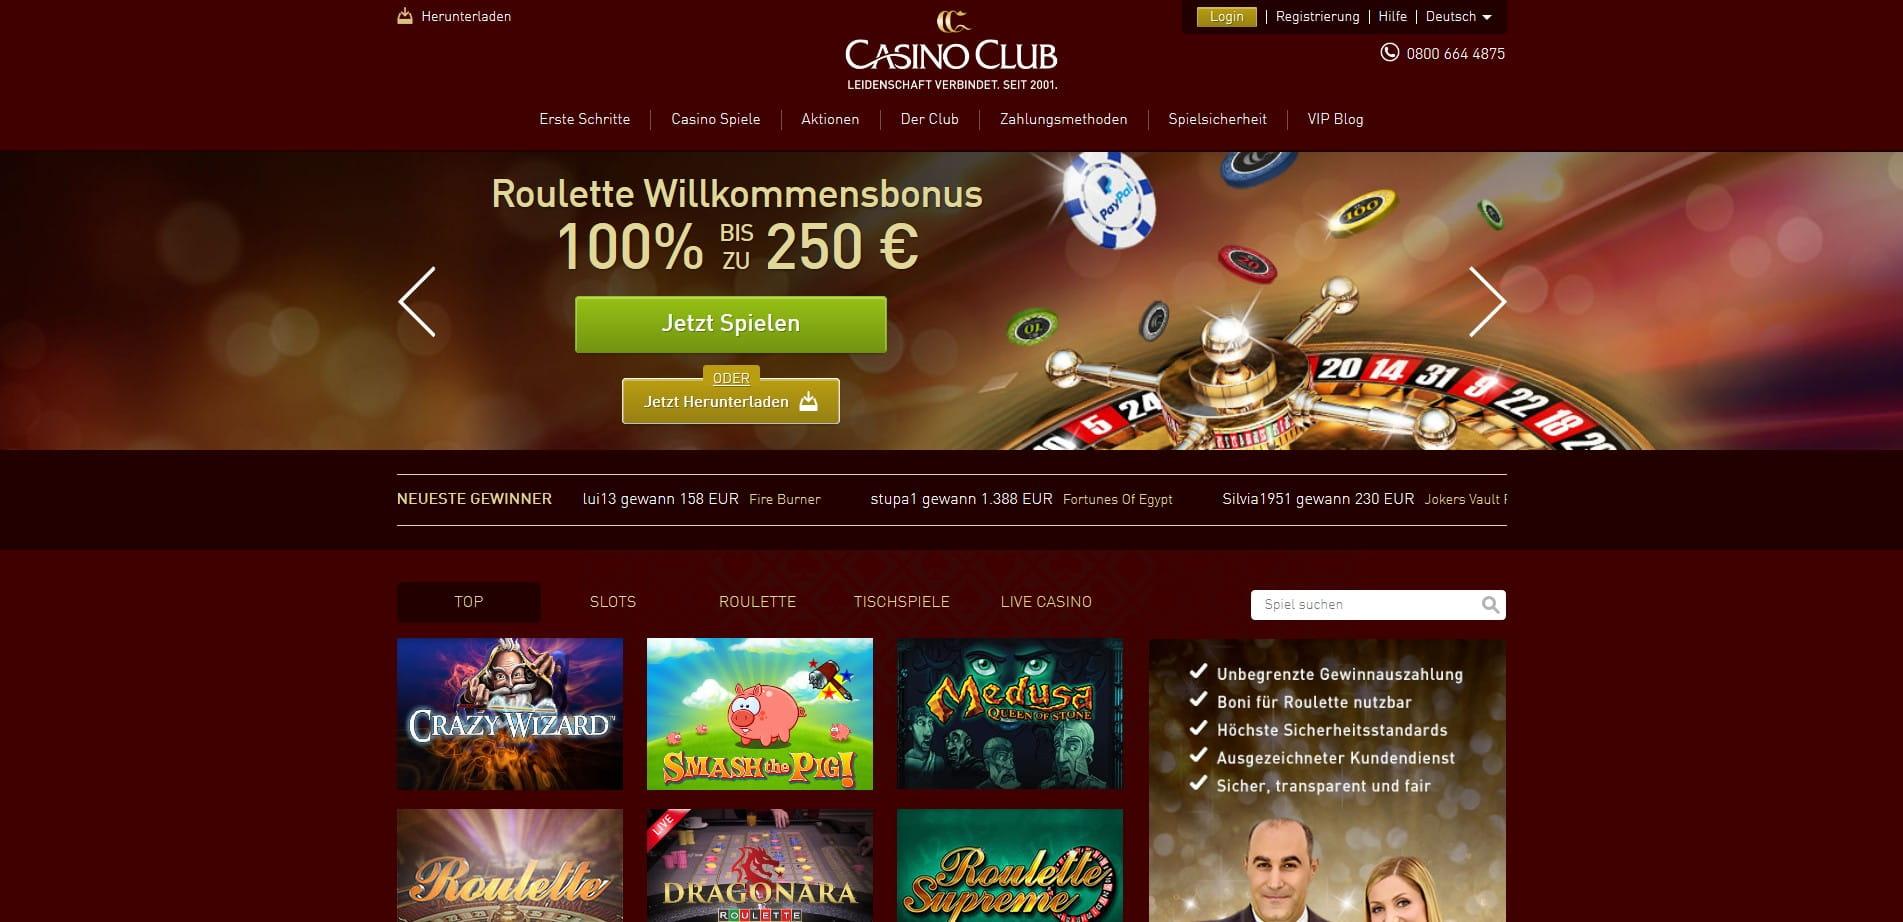 Casino Club Erfahrungen Roulette